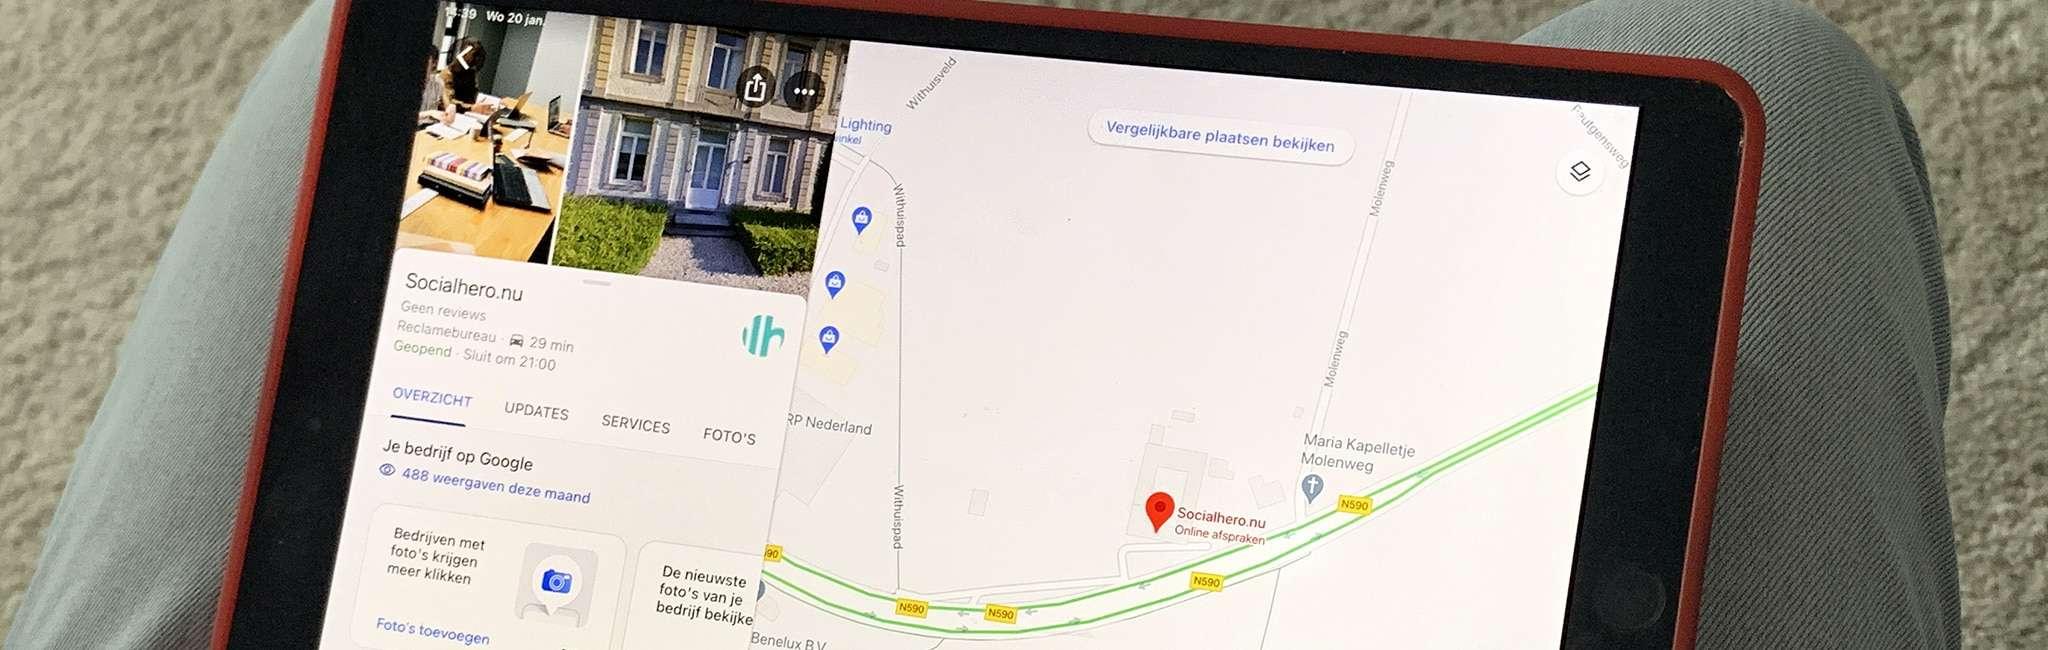 google maps covid-19 berichten